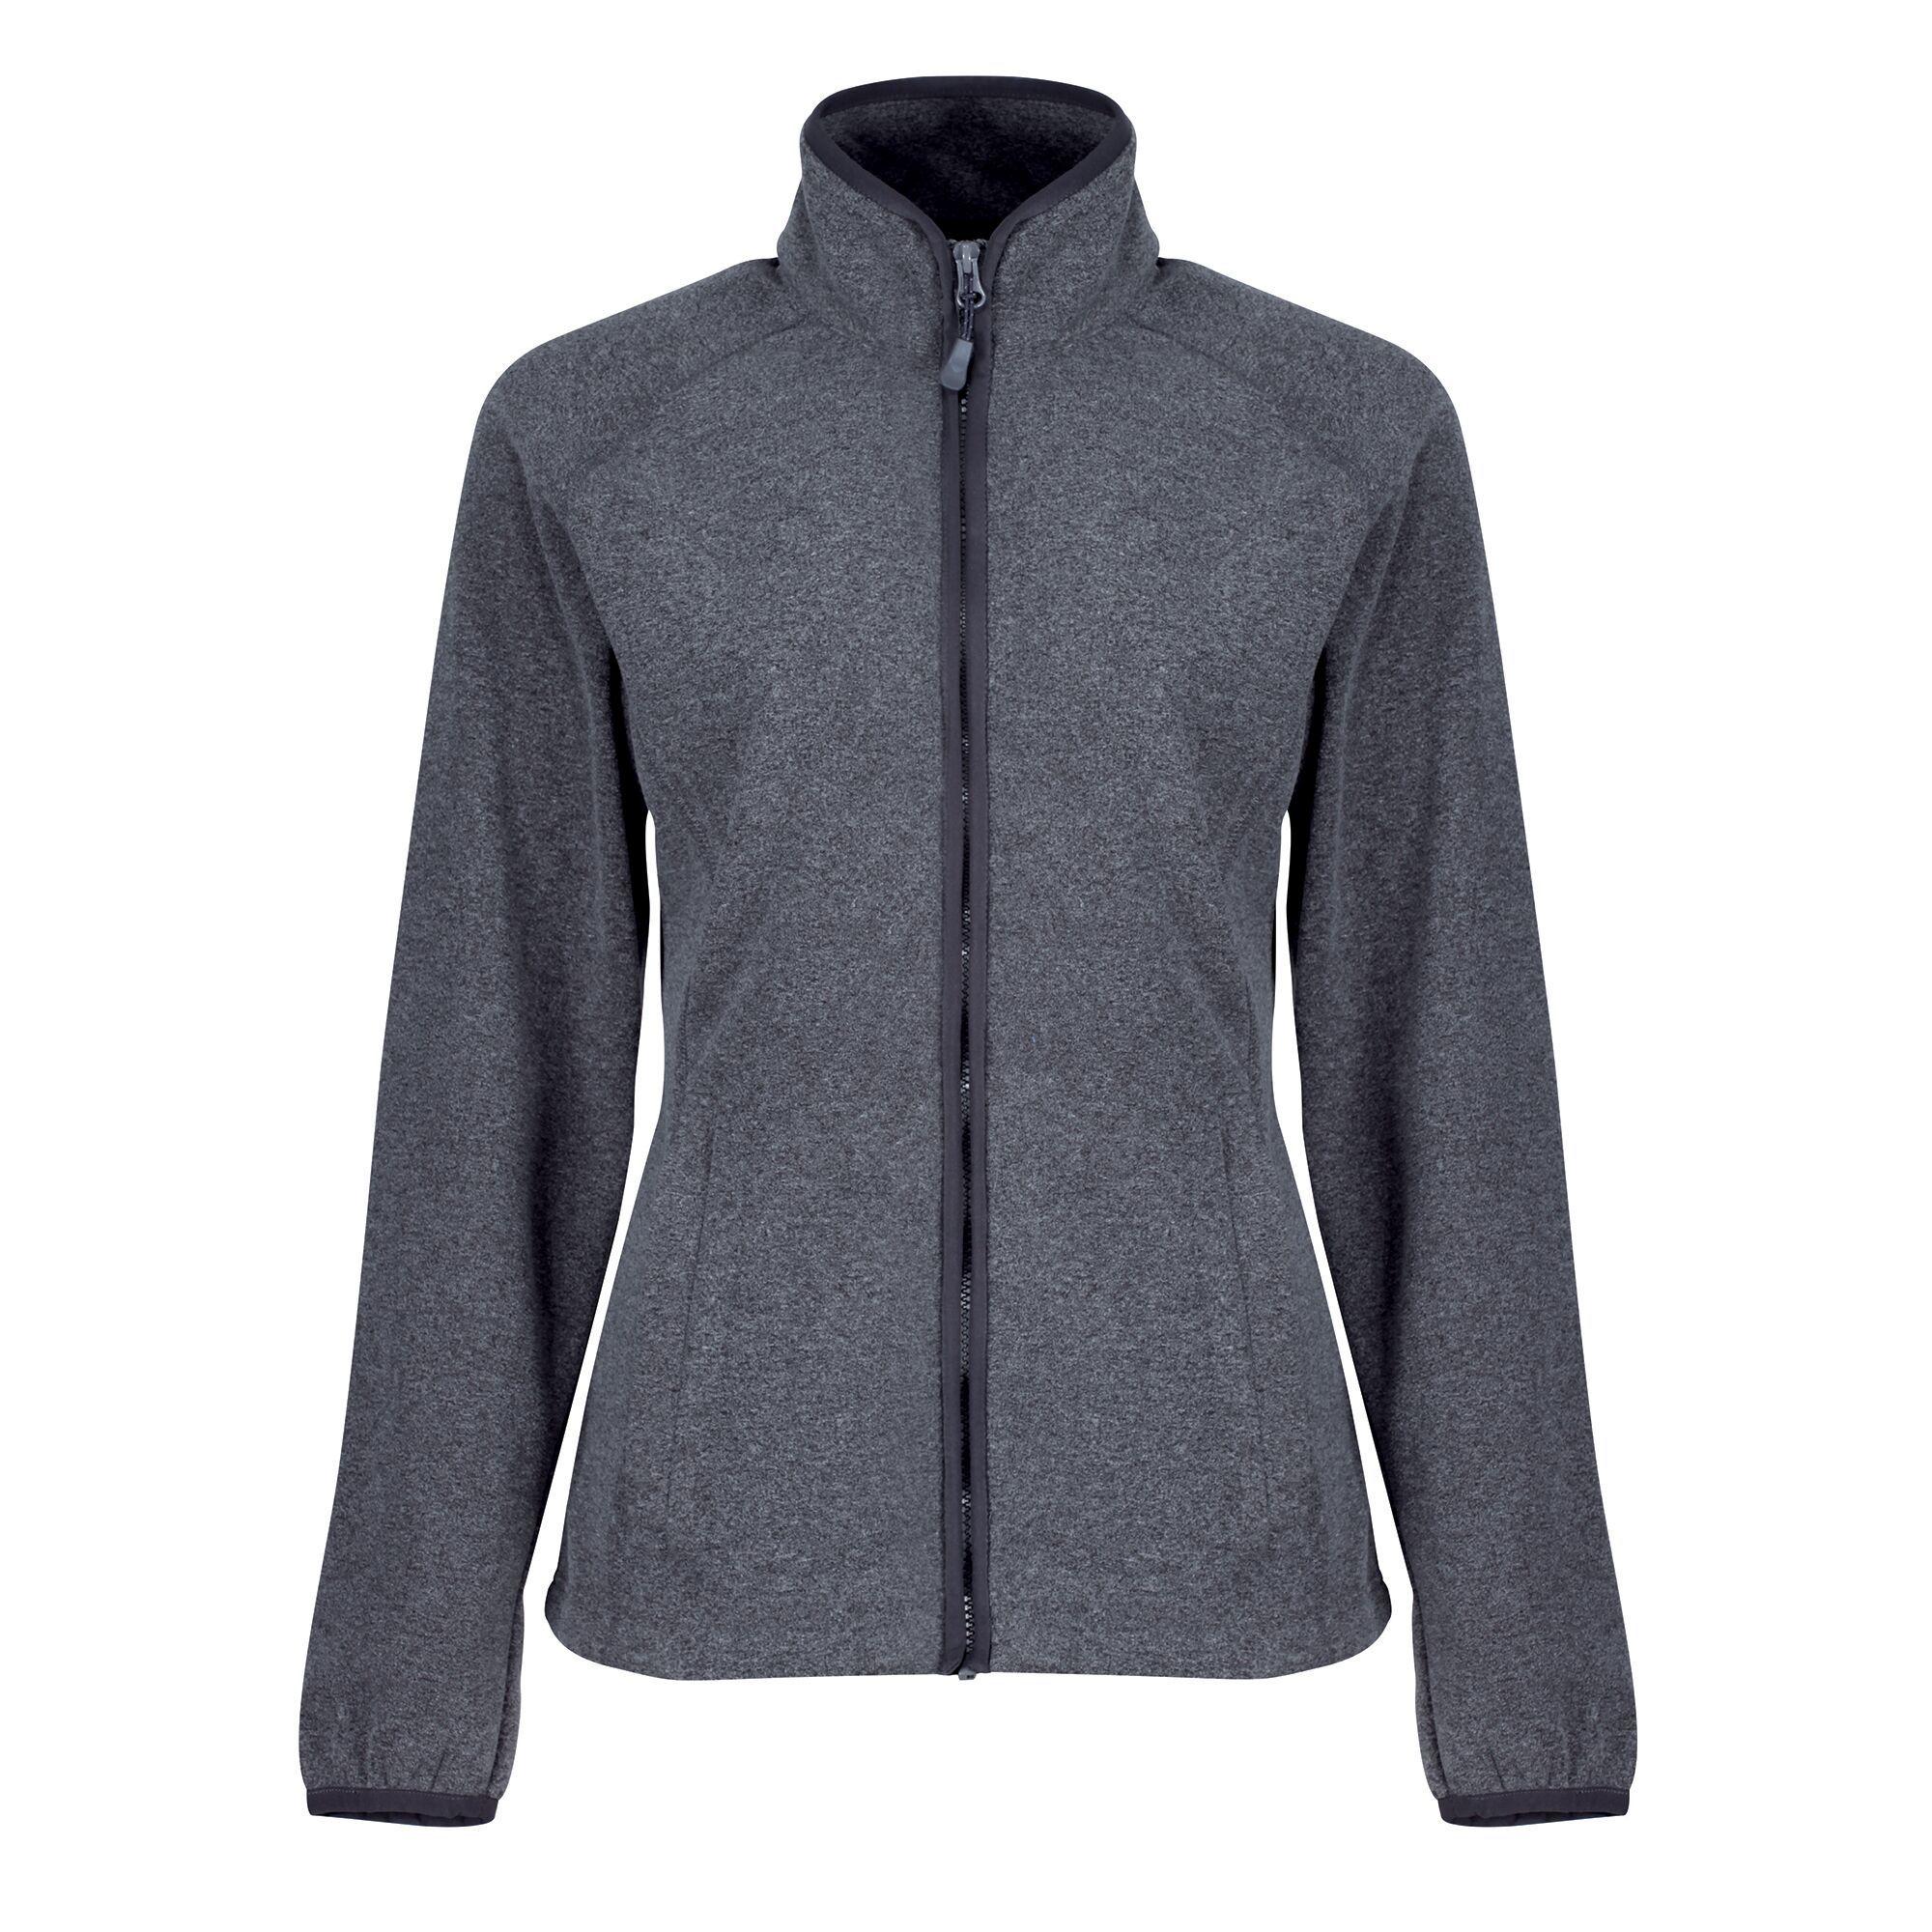 Regatta Womens/Ladies Salamba Marl Fleece Jacket (8 UK) (Grey)